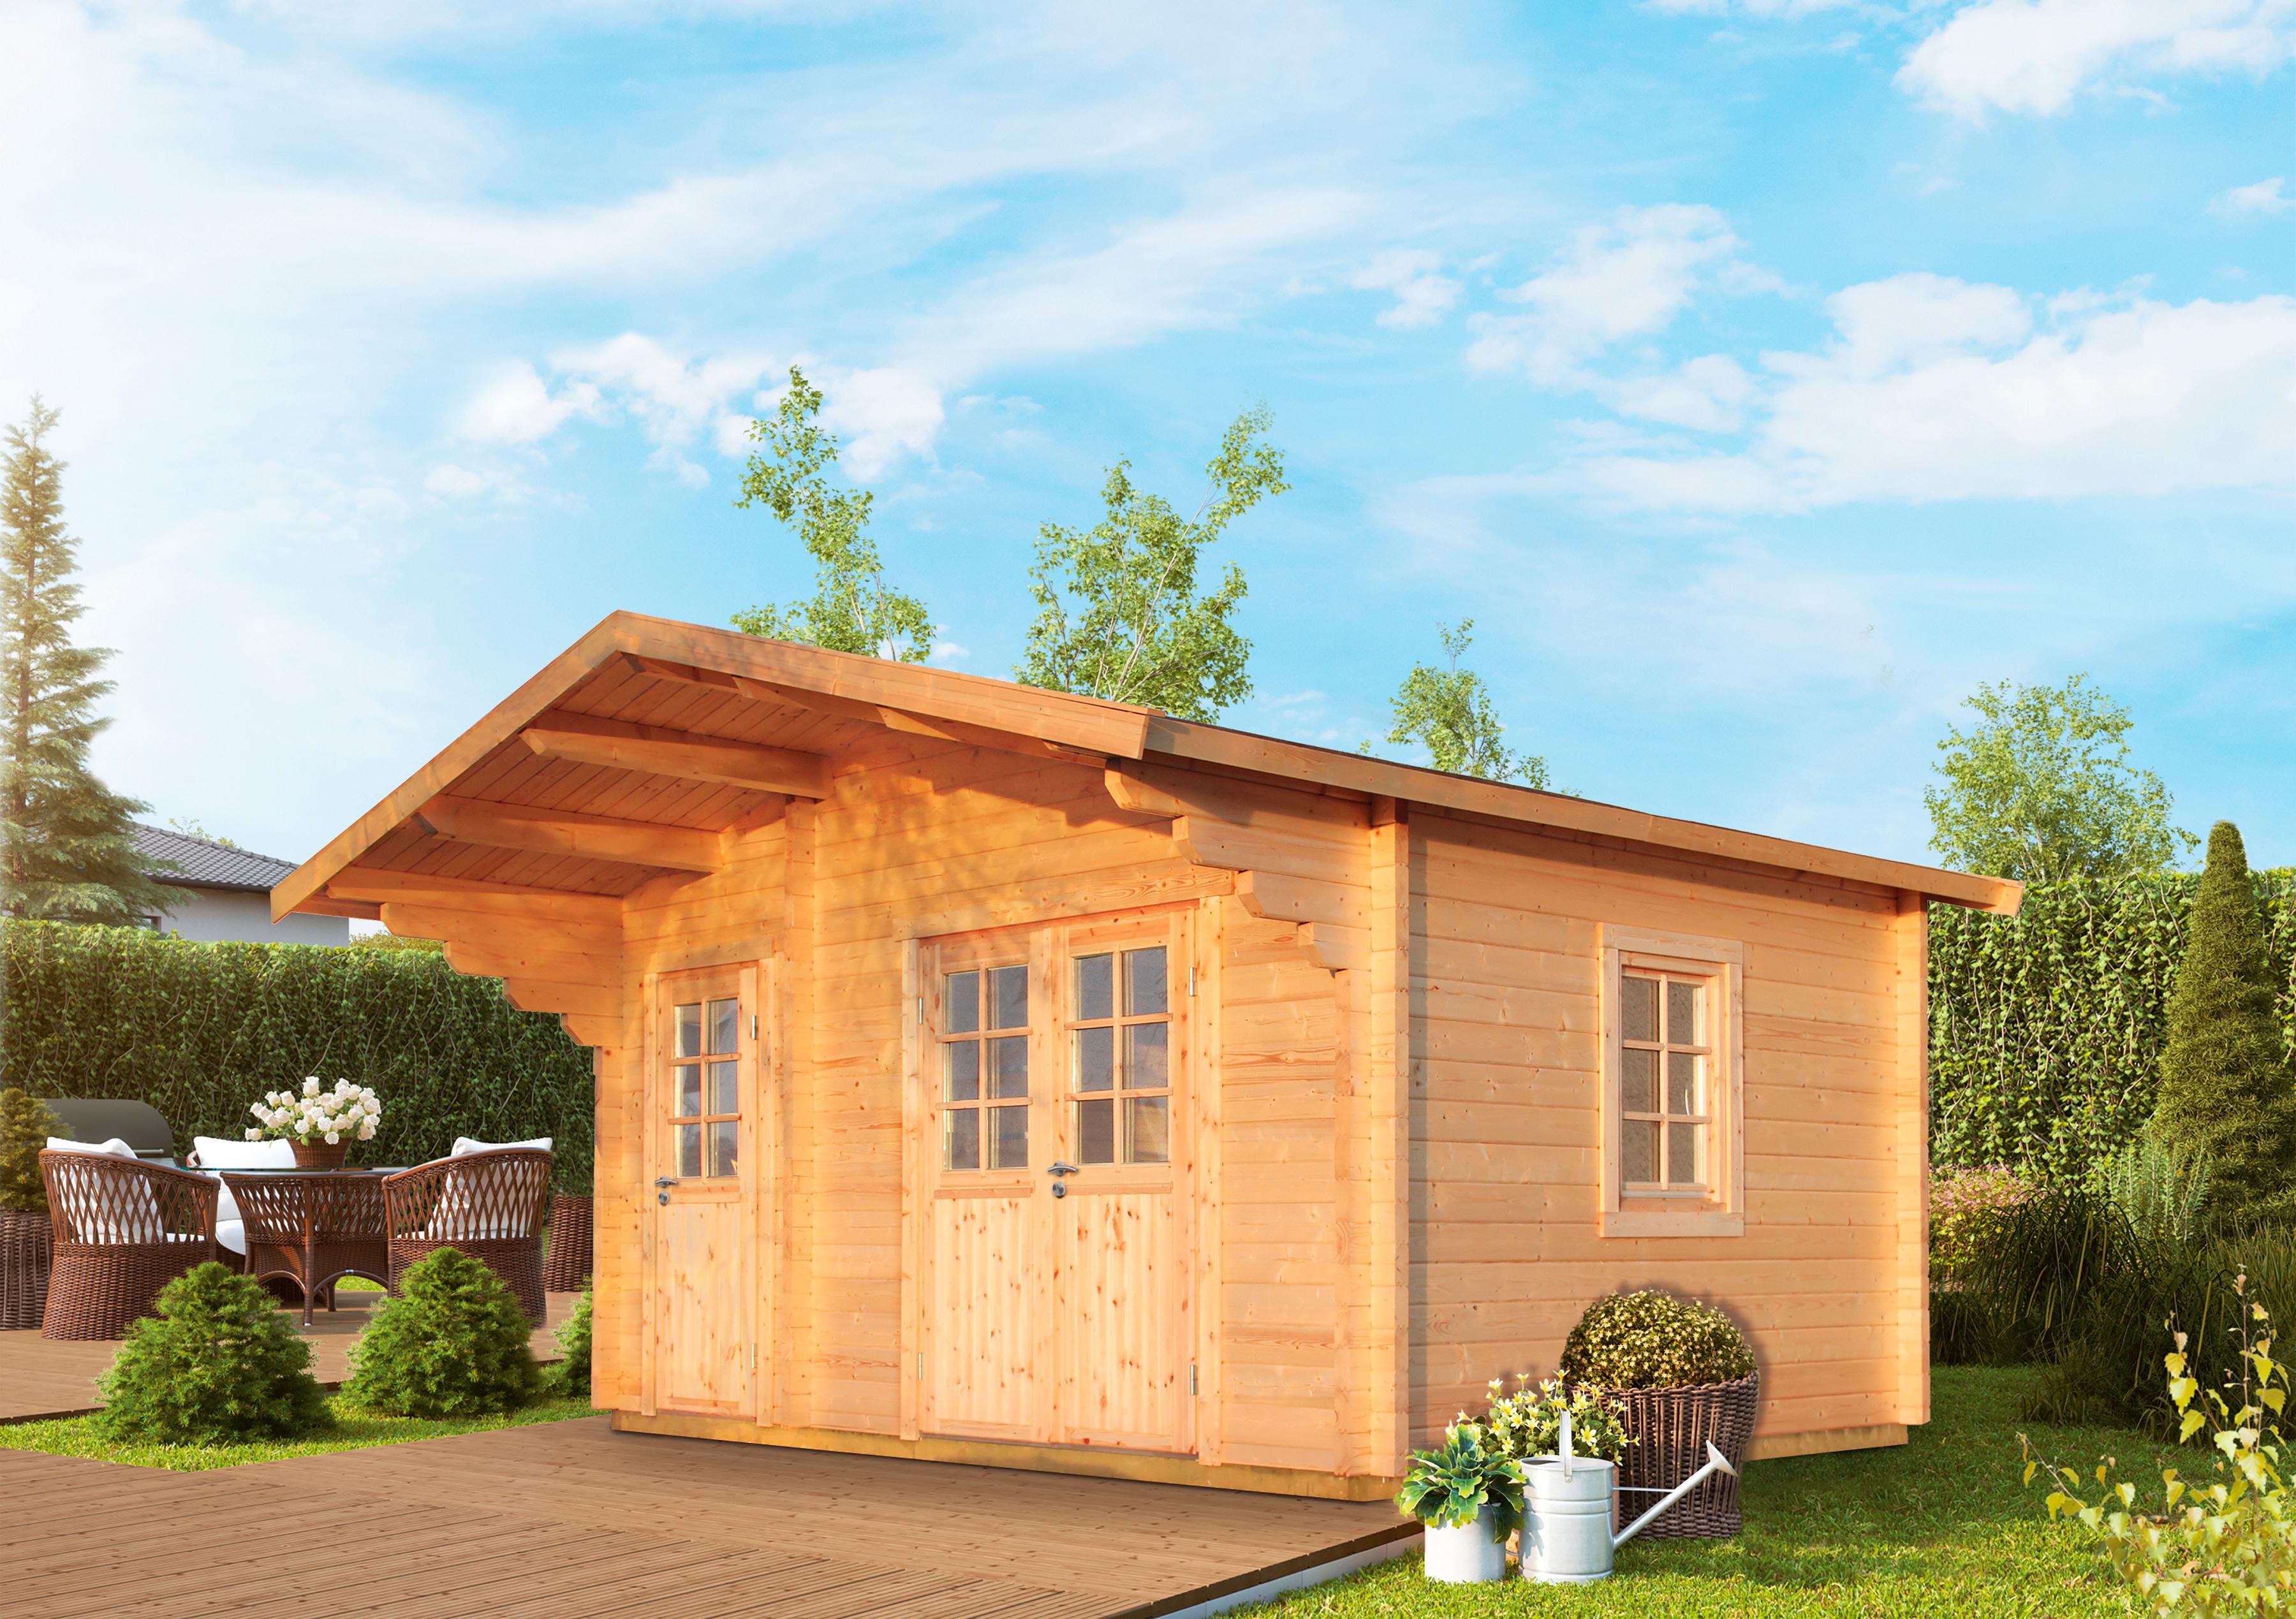 WOLFF FINNHAUS Gartenhaus »Caro 58-B Klassik«, BxT: 510x360 cm, inkl. Fußboden, mit 2 Räumen | Garten > Bodenbeläge-Garten | Natur | Fichte - Hölzer | WOLFF FINNHAUS